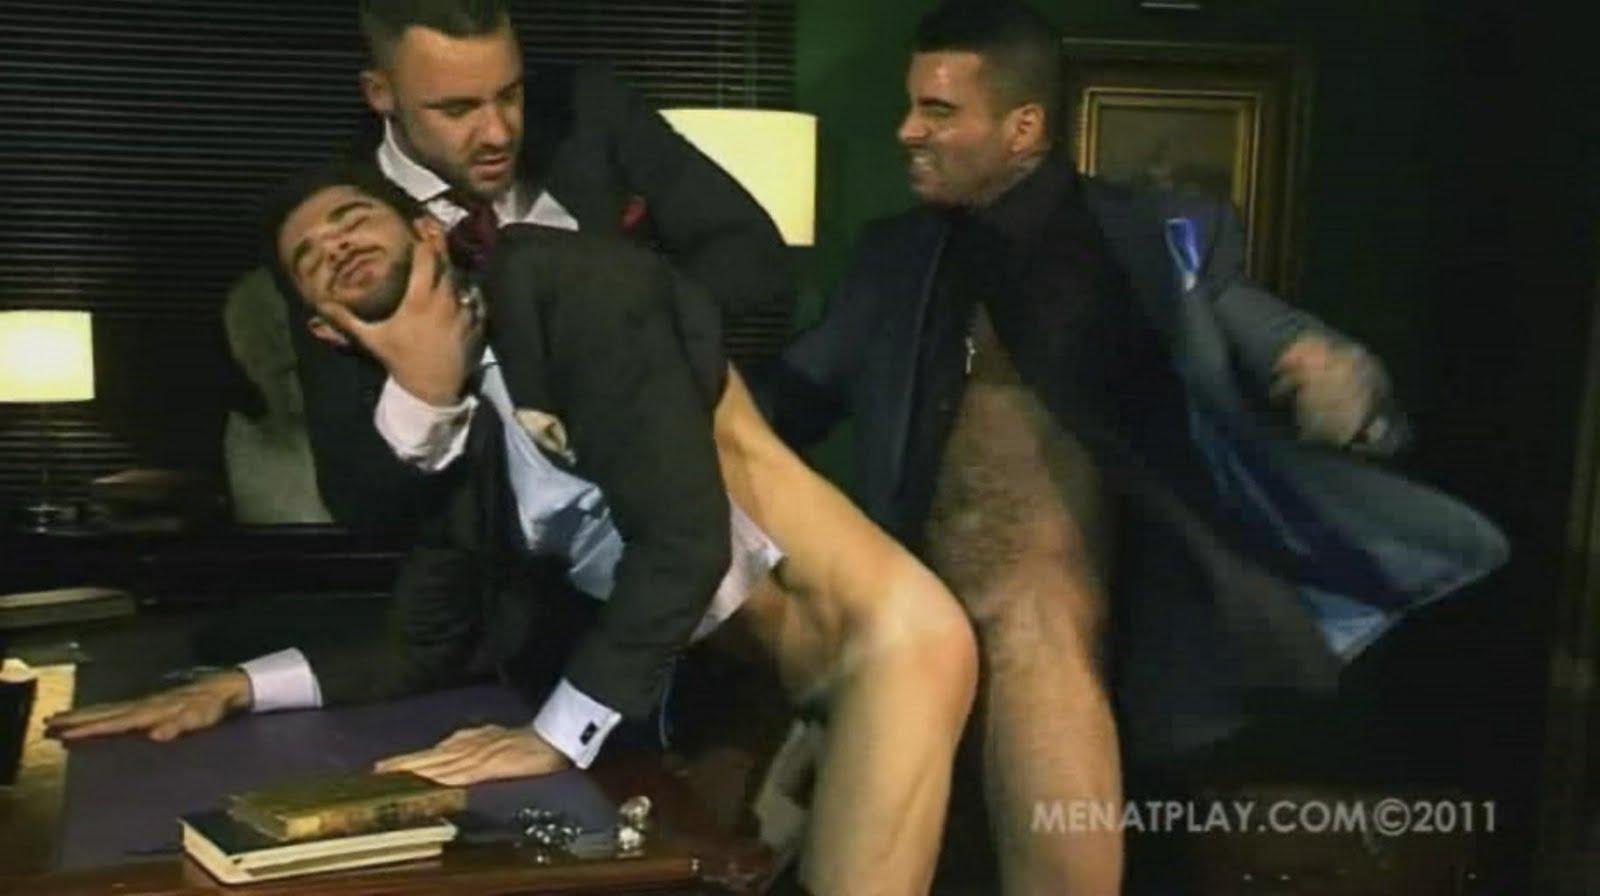 bakekaincontri gay roma massaggi happy ending milano